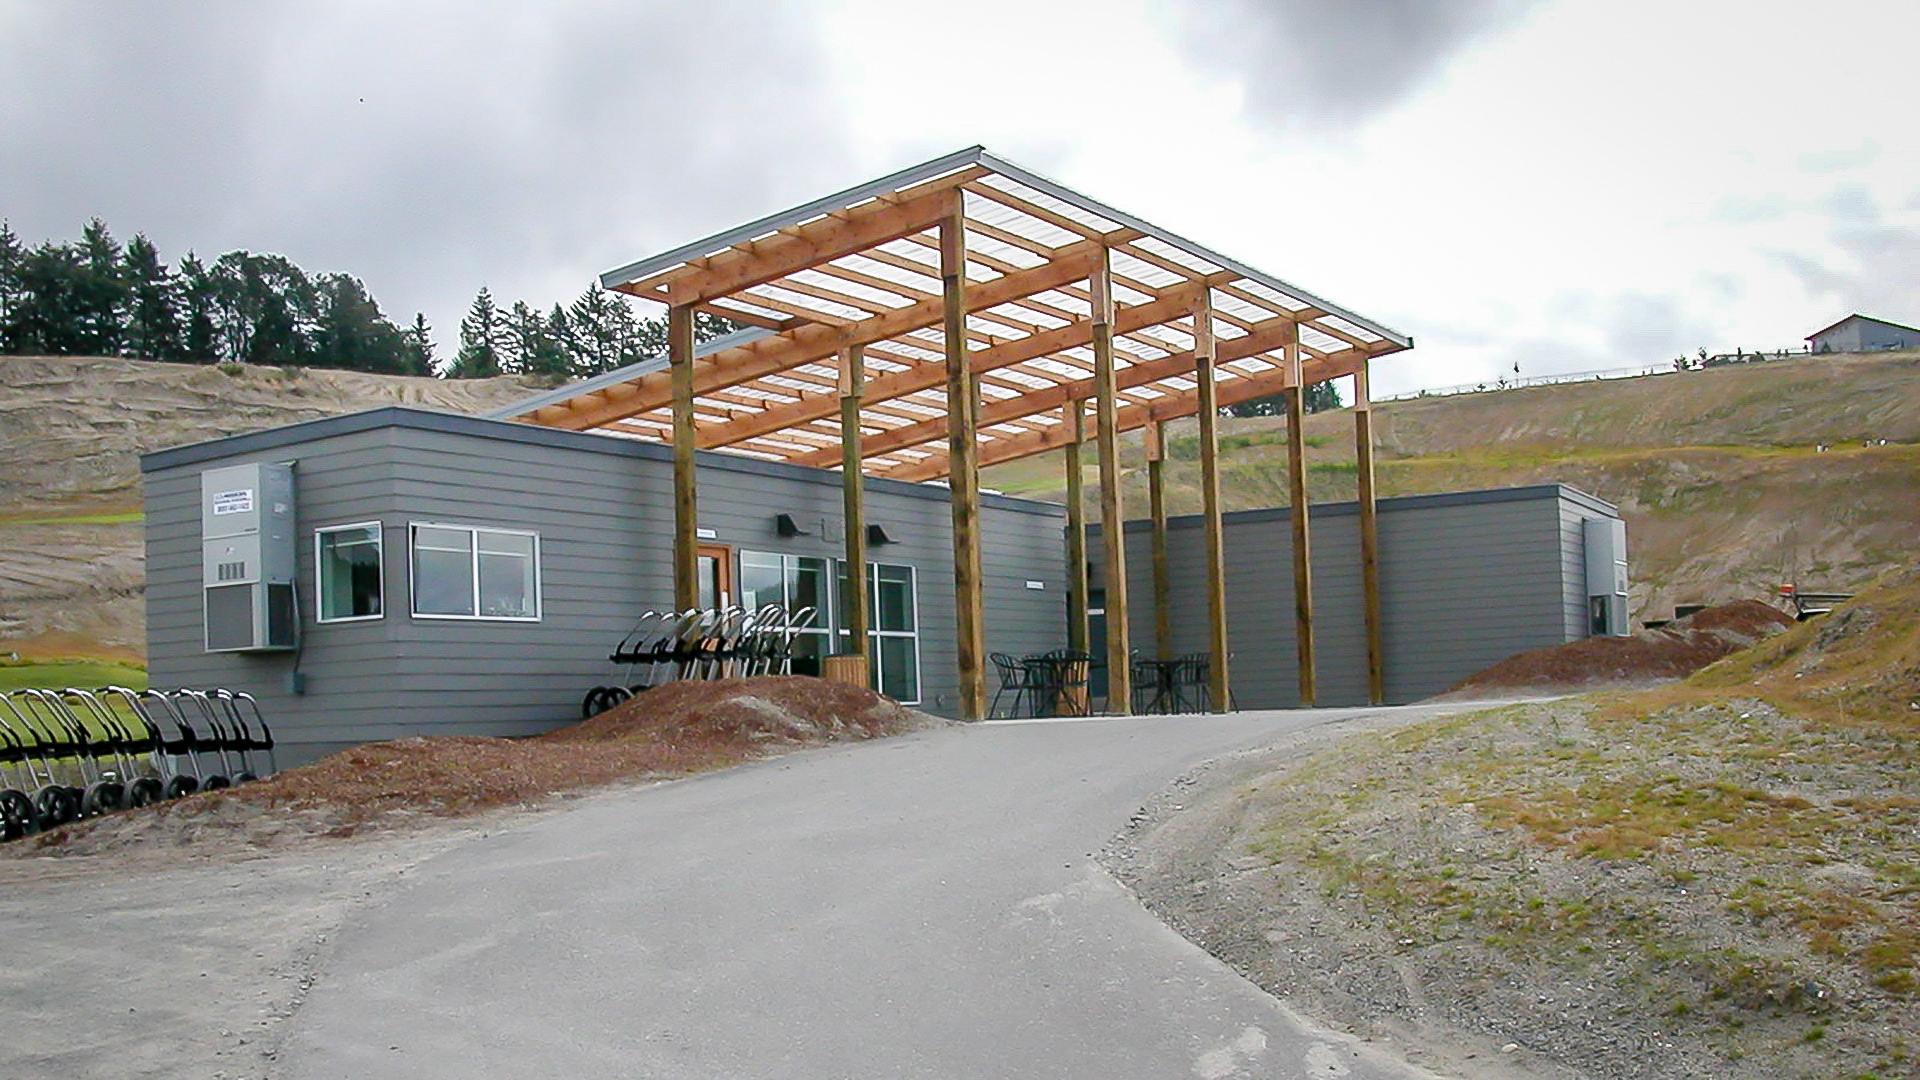 Modular building exterior 2020 | Modern Building Systems, Inc.®